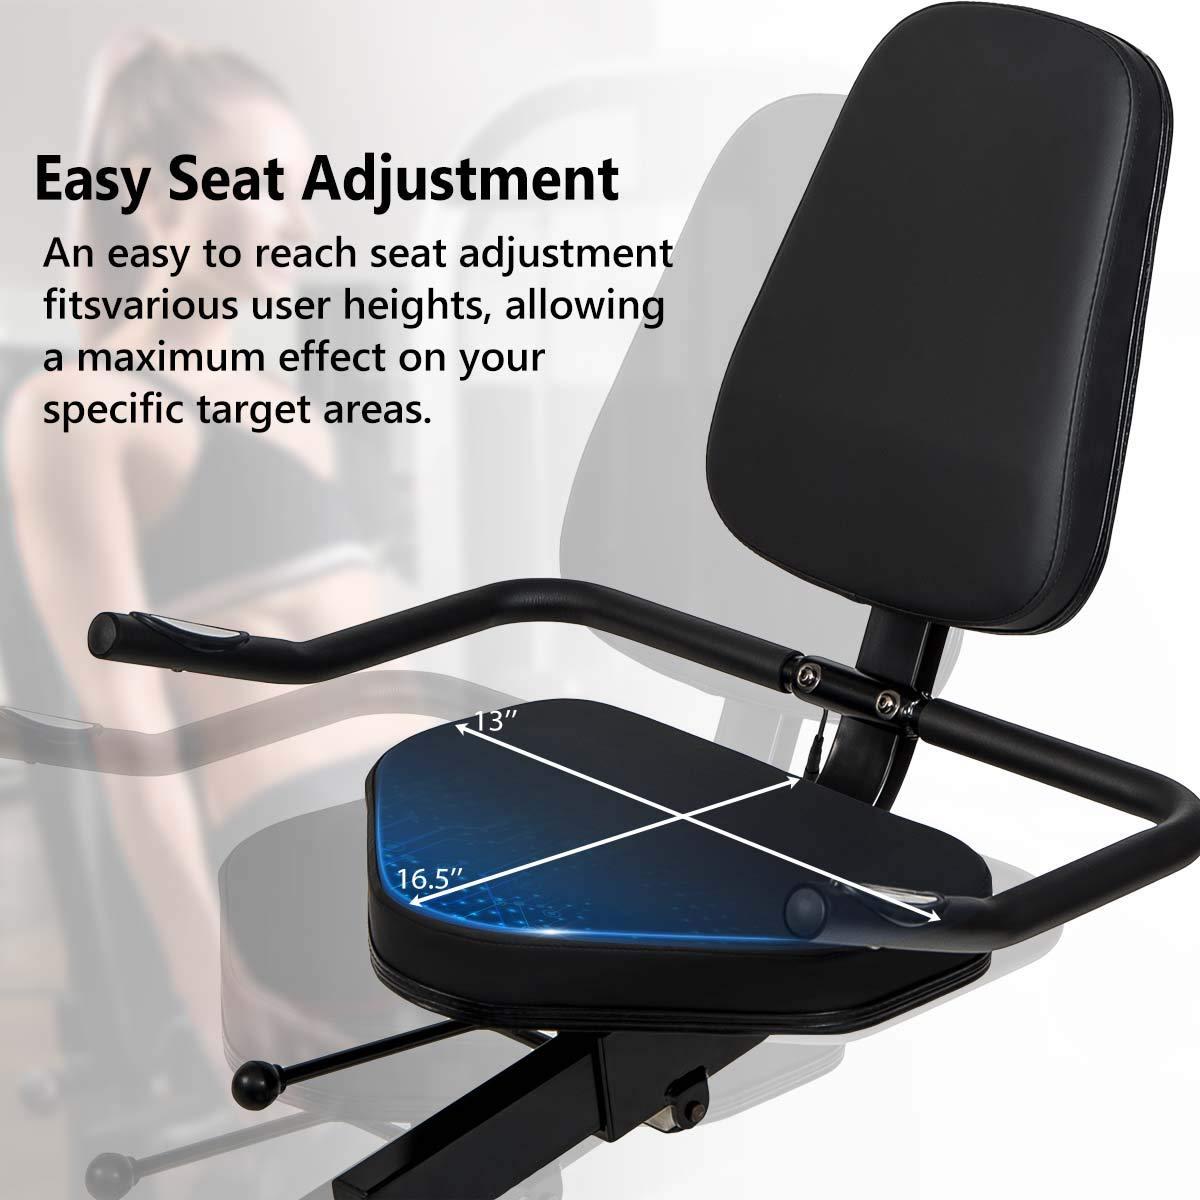 Merax Magnetic Recumbent Exercise Bike | 8-Level Resistance | Quick Adjust Seat (Black/Yellow) by Merax (Image #4)